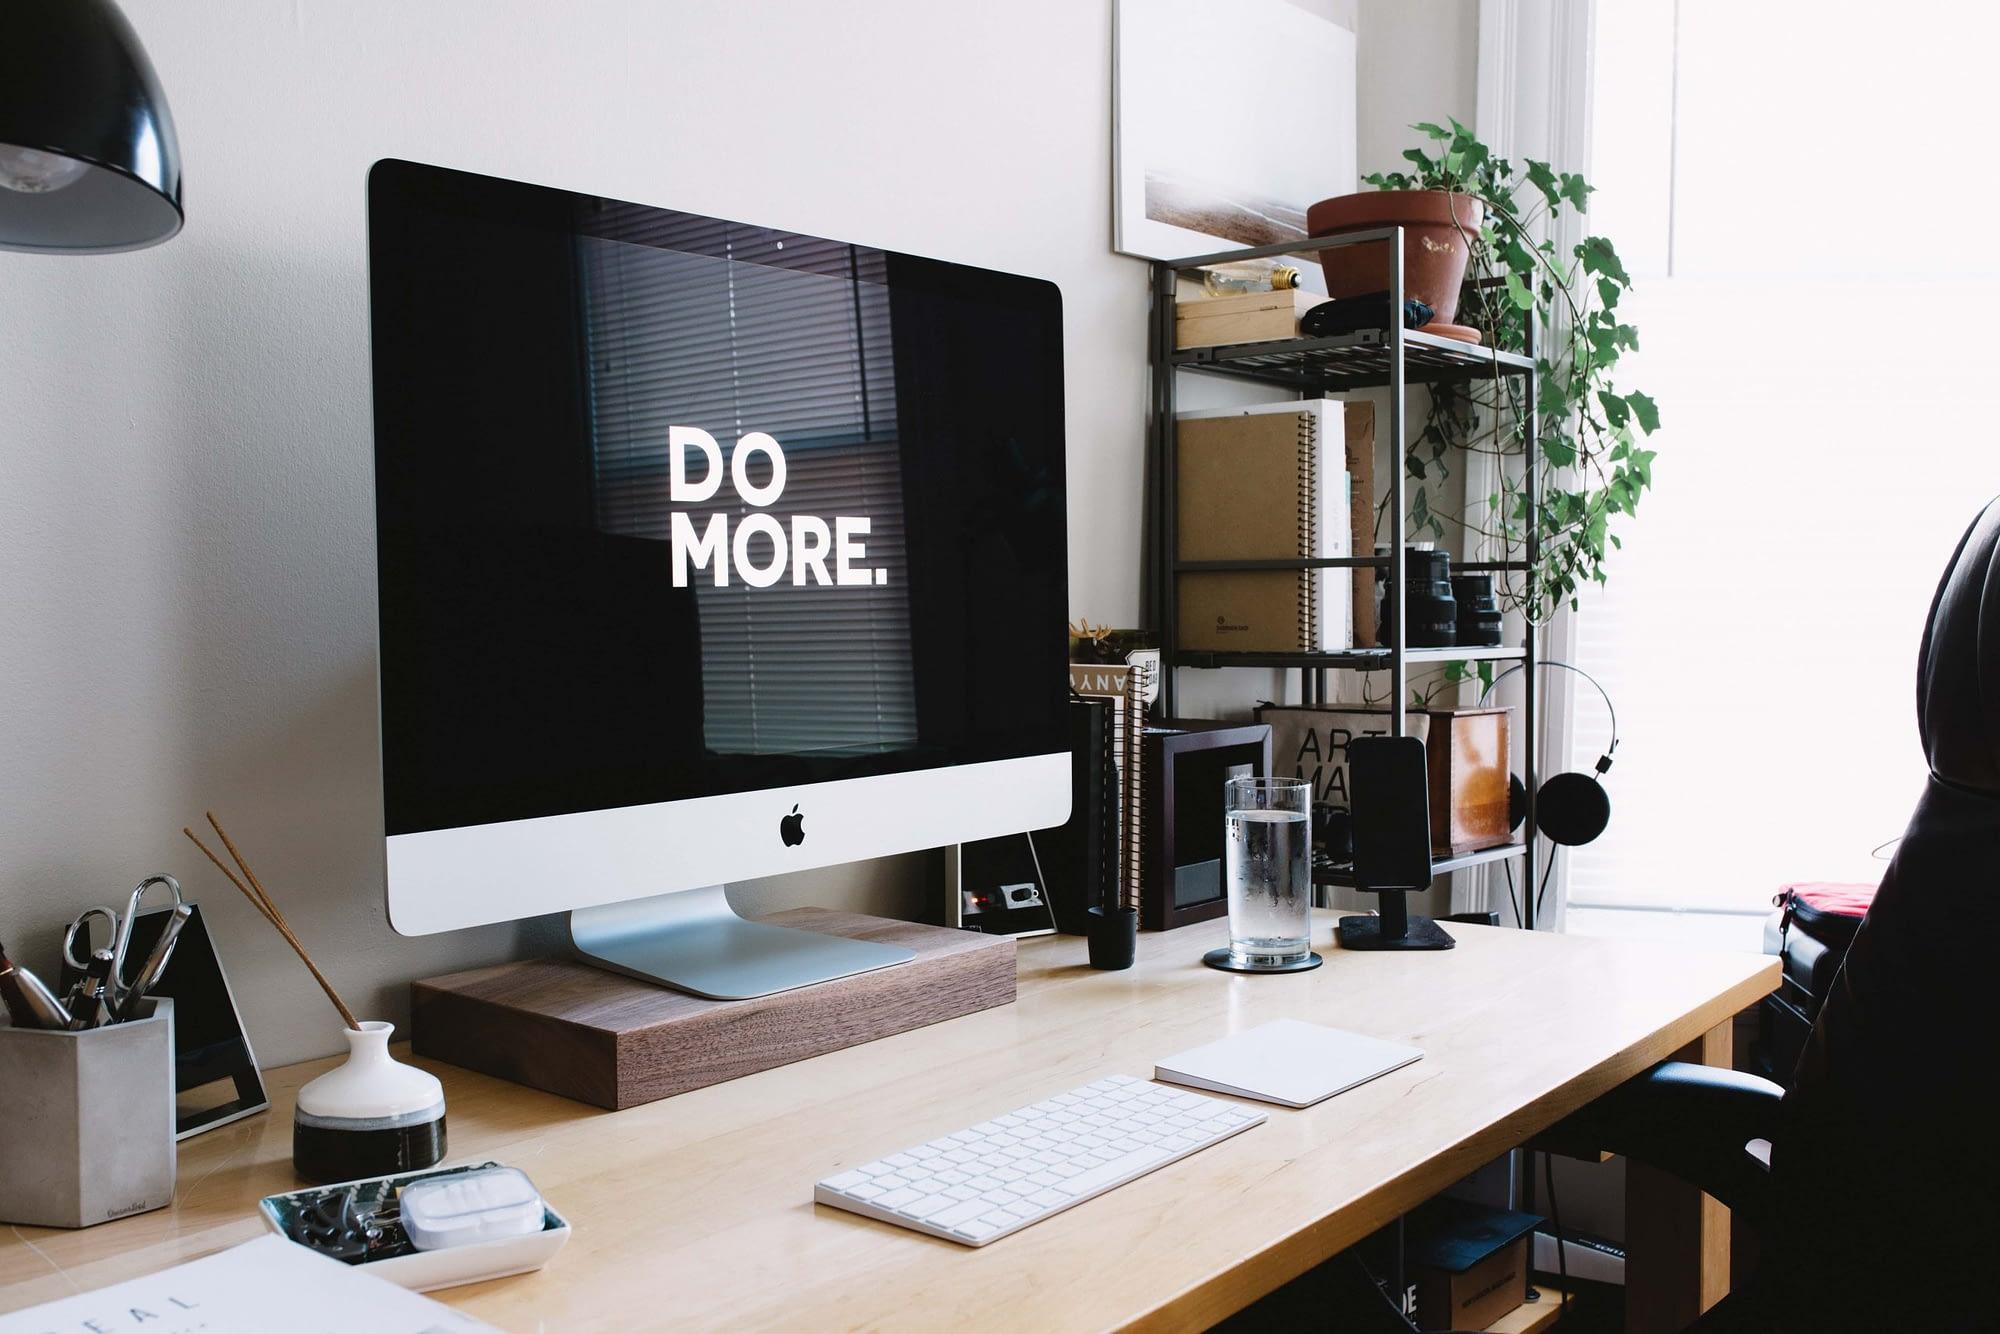 Benefits of Hiring a Digital Marketing Agency